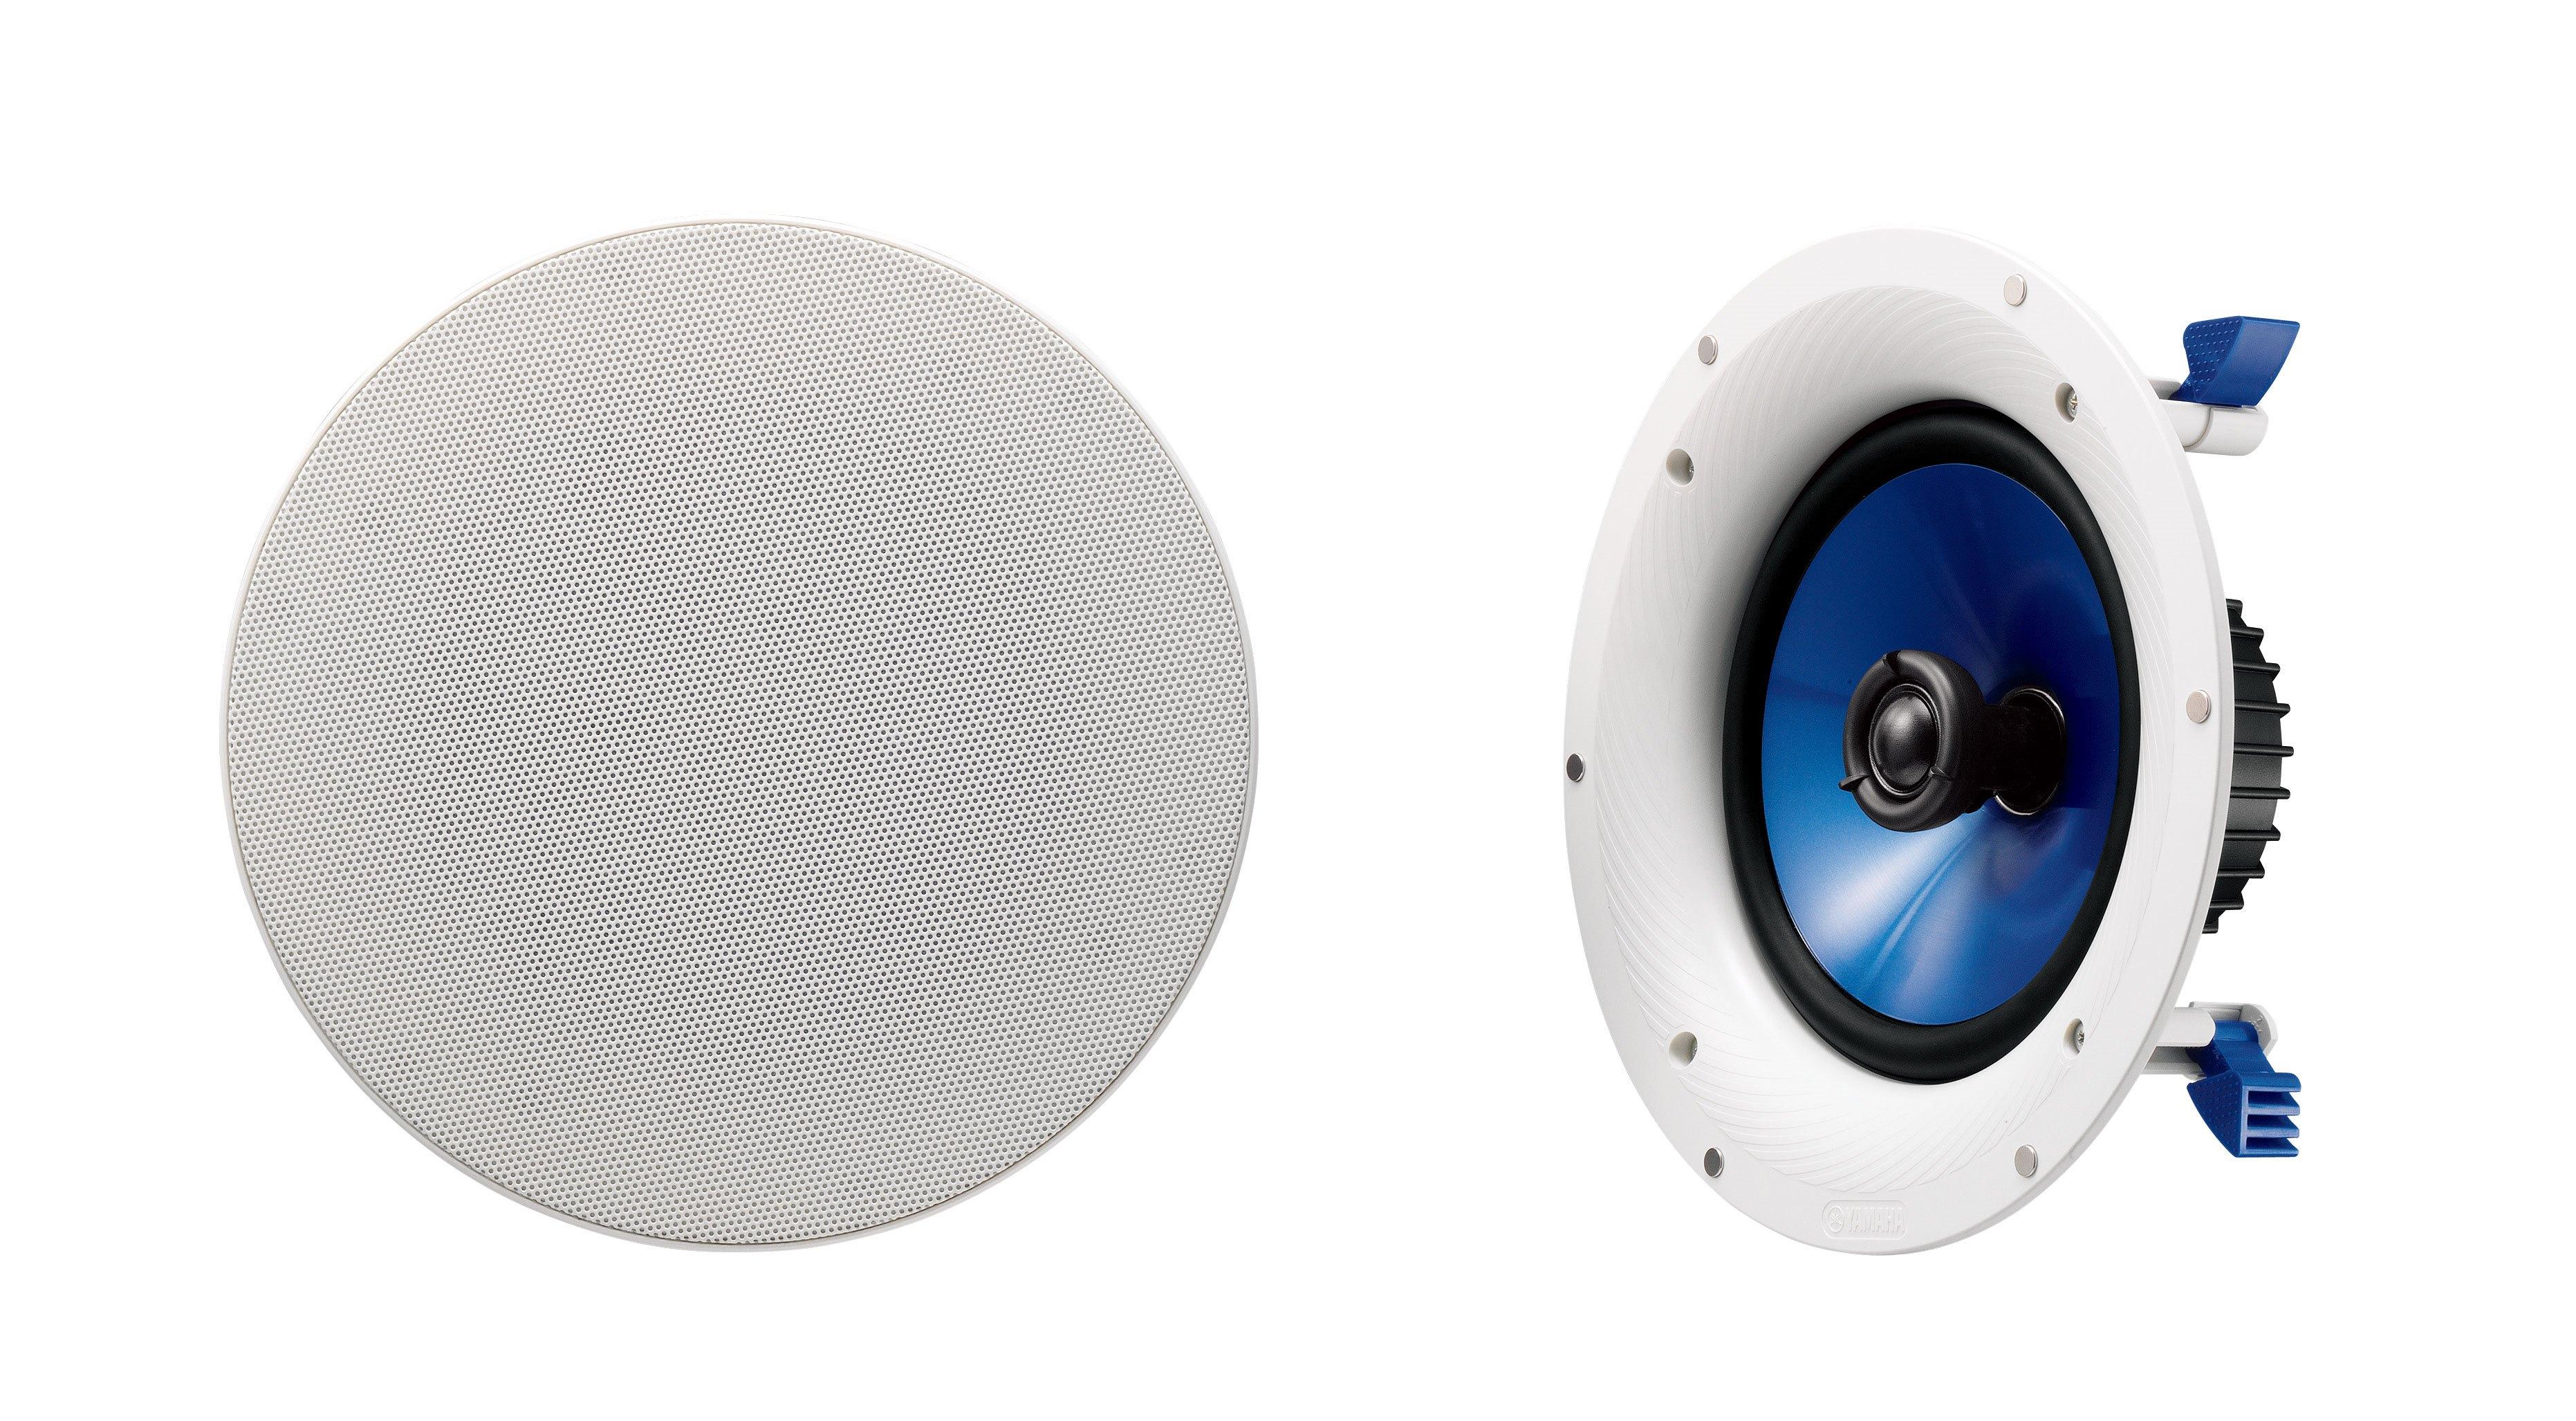 bluetooth ceiling slave lithe master speaker masterslave speakers audio wireless boutique pair